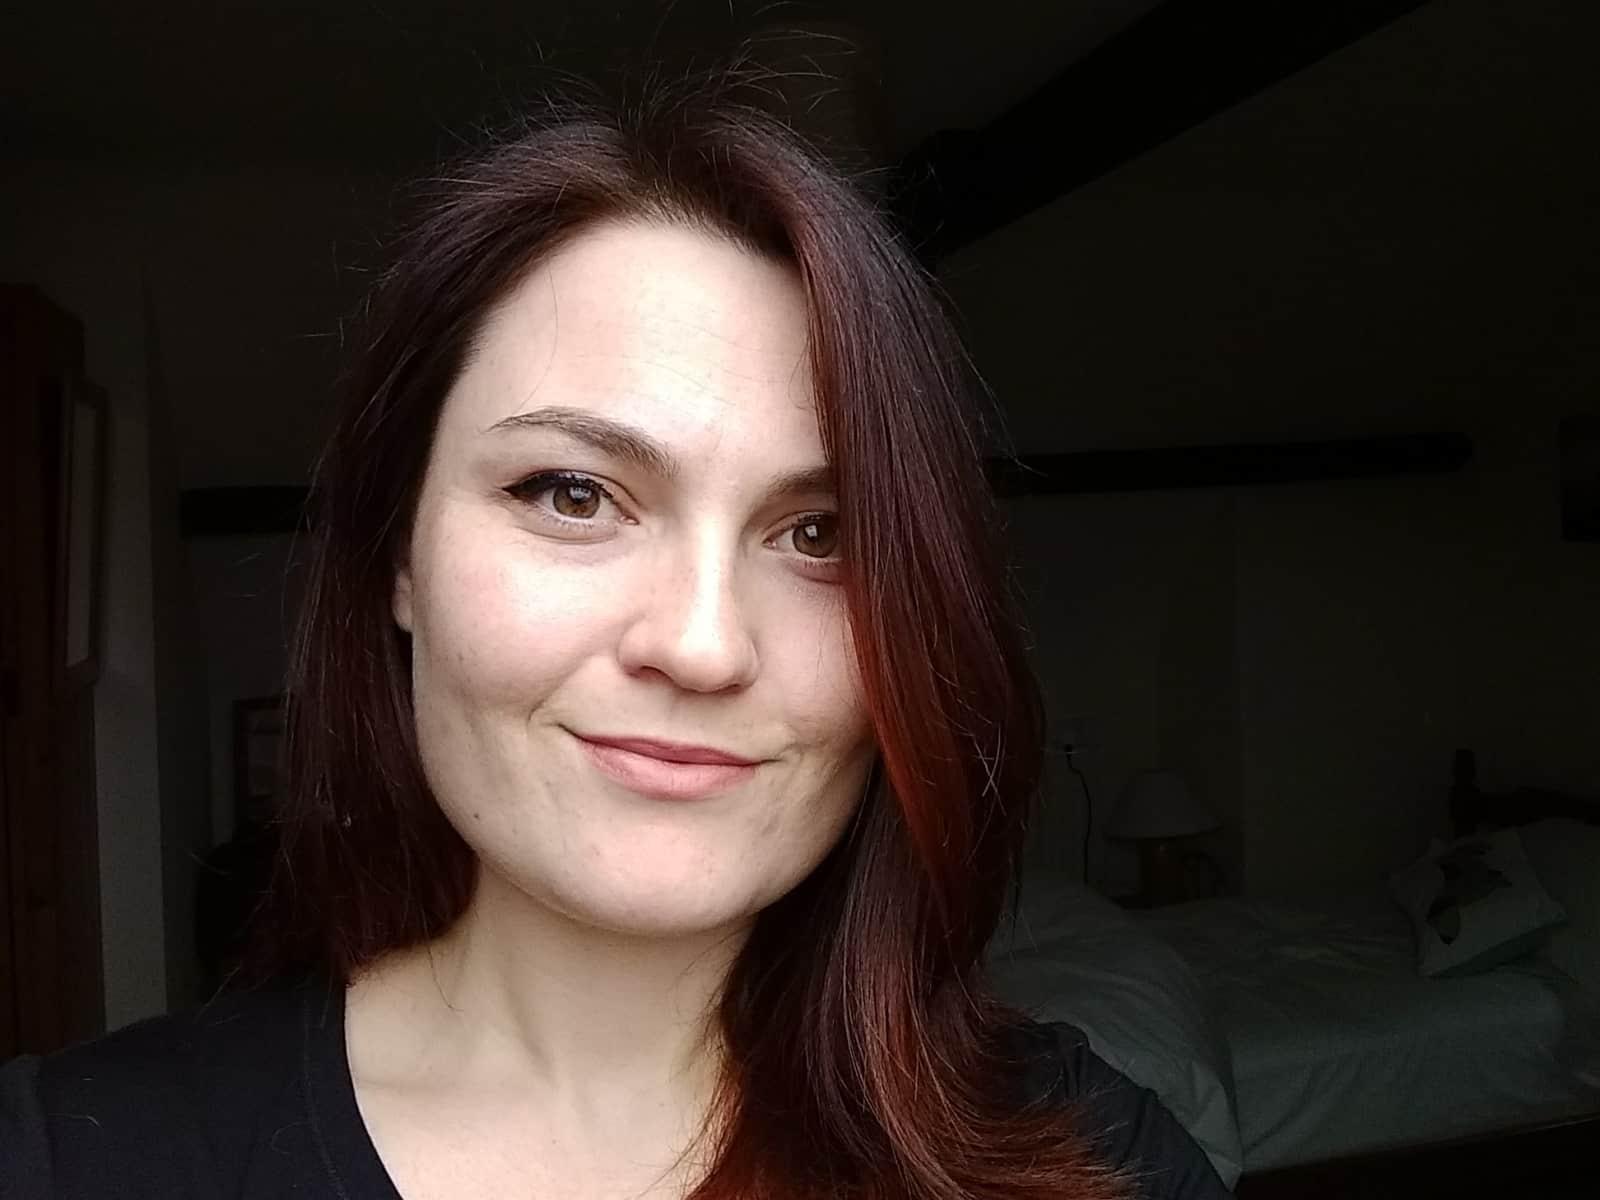 Jess from Cardiff, United Kingdom